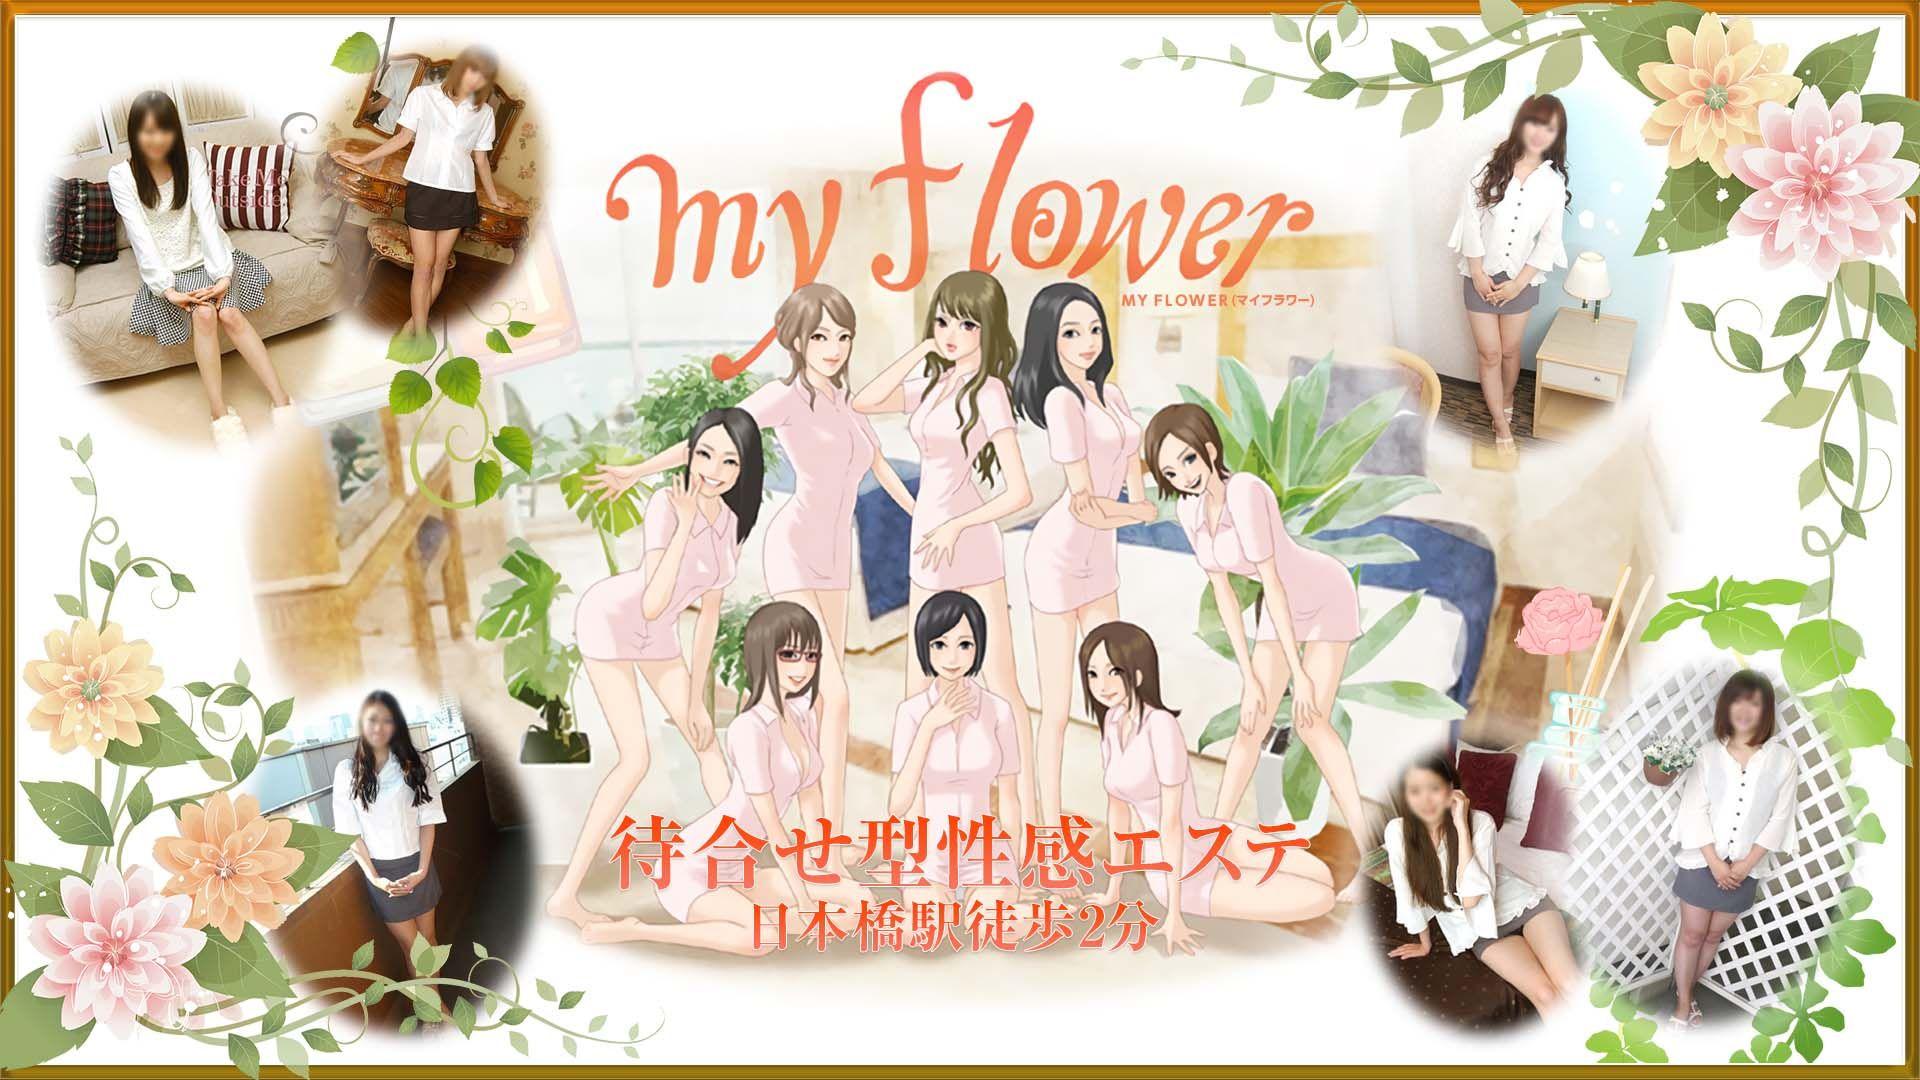 my flower(マイフラワー)